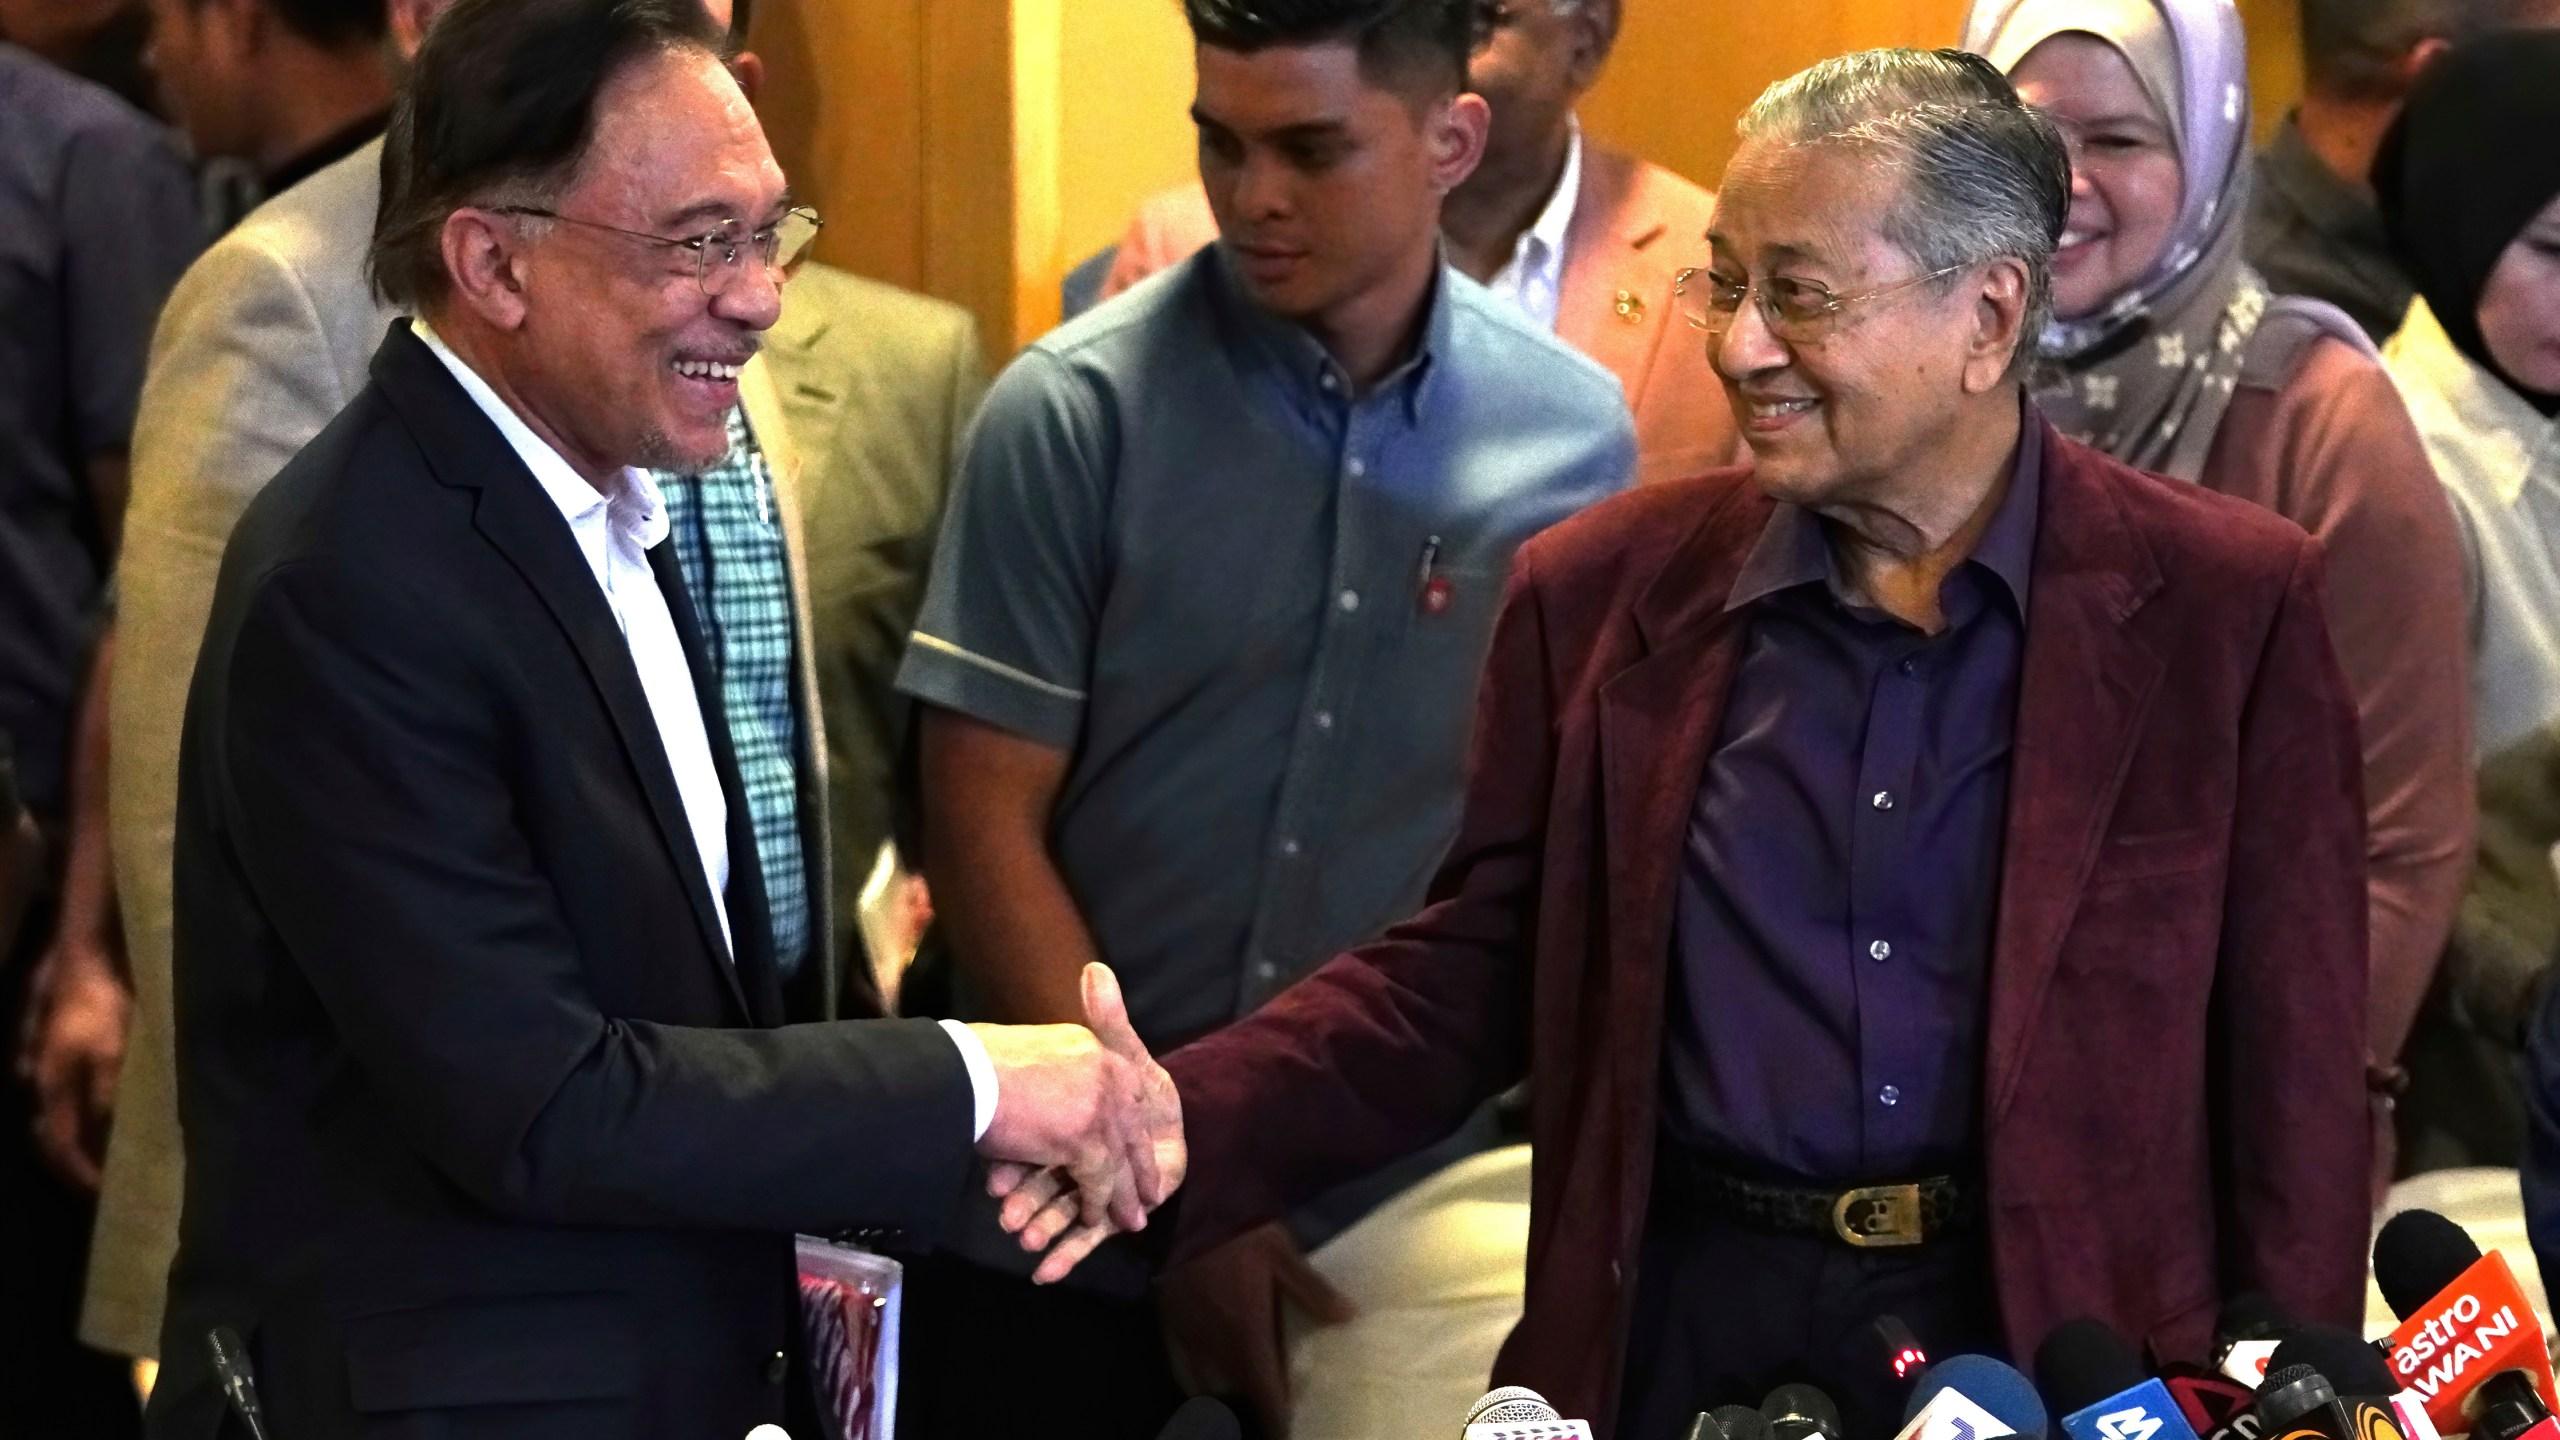 Mahathir Mohamad, Anwar Ibrahim